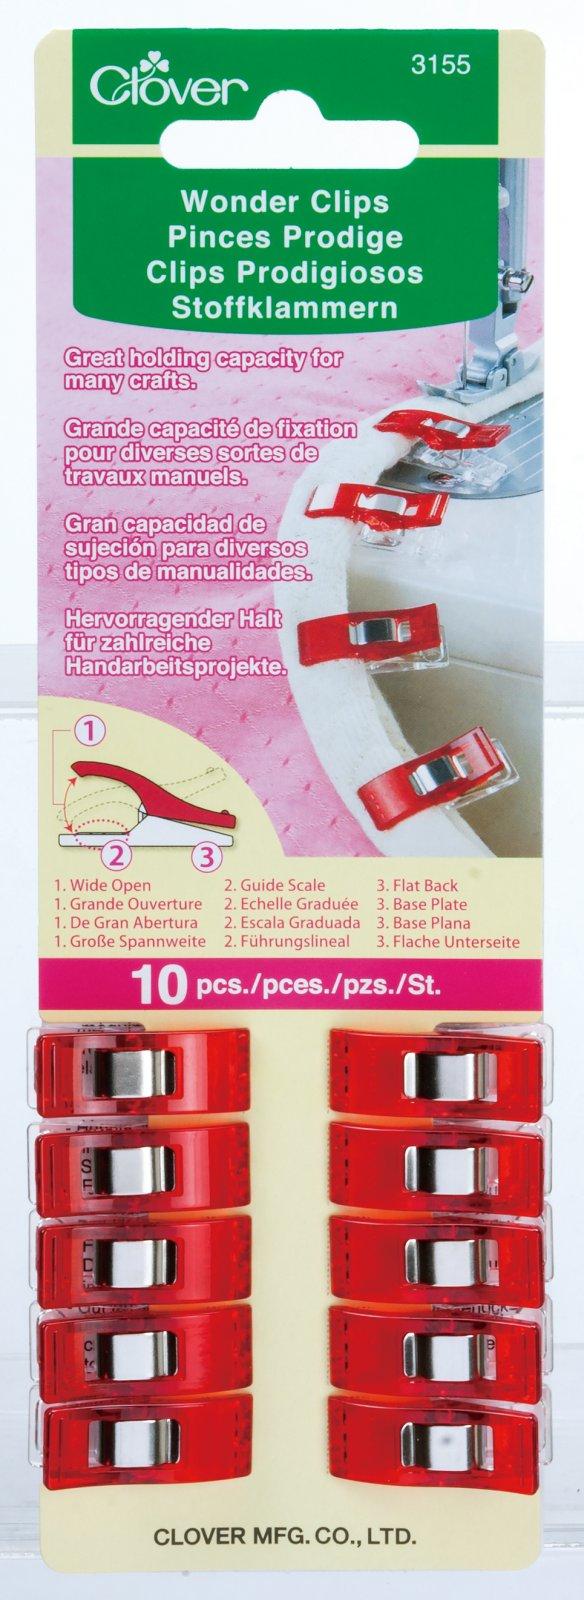 Pack of 10 Clover Wonder Clips